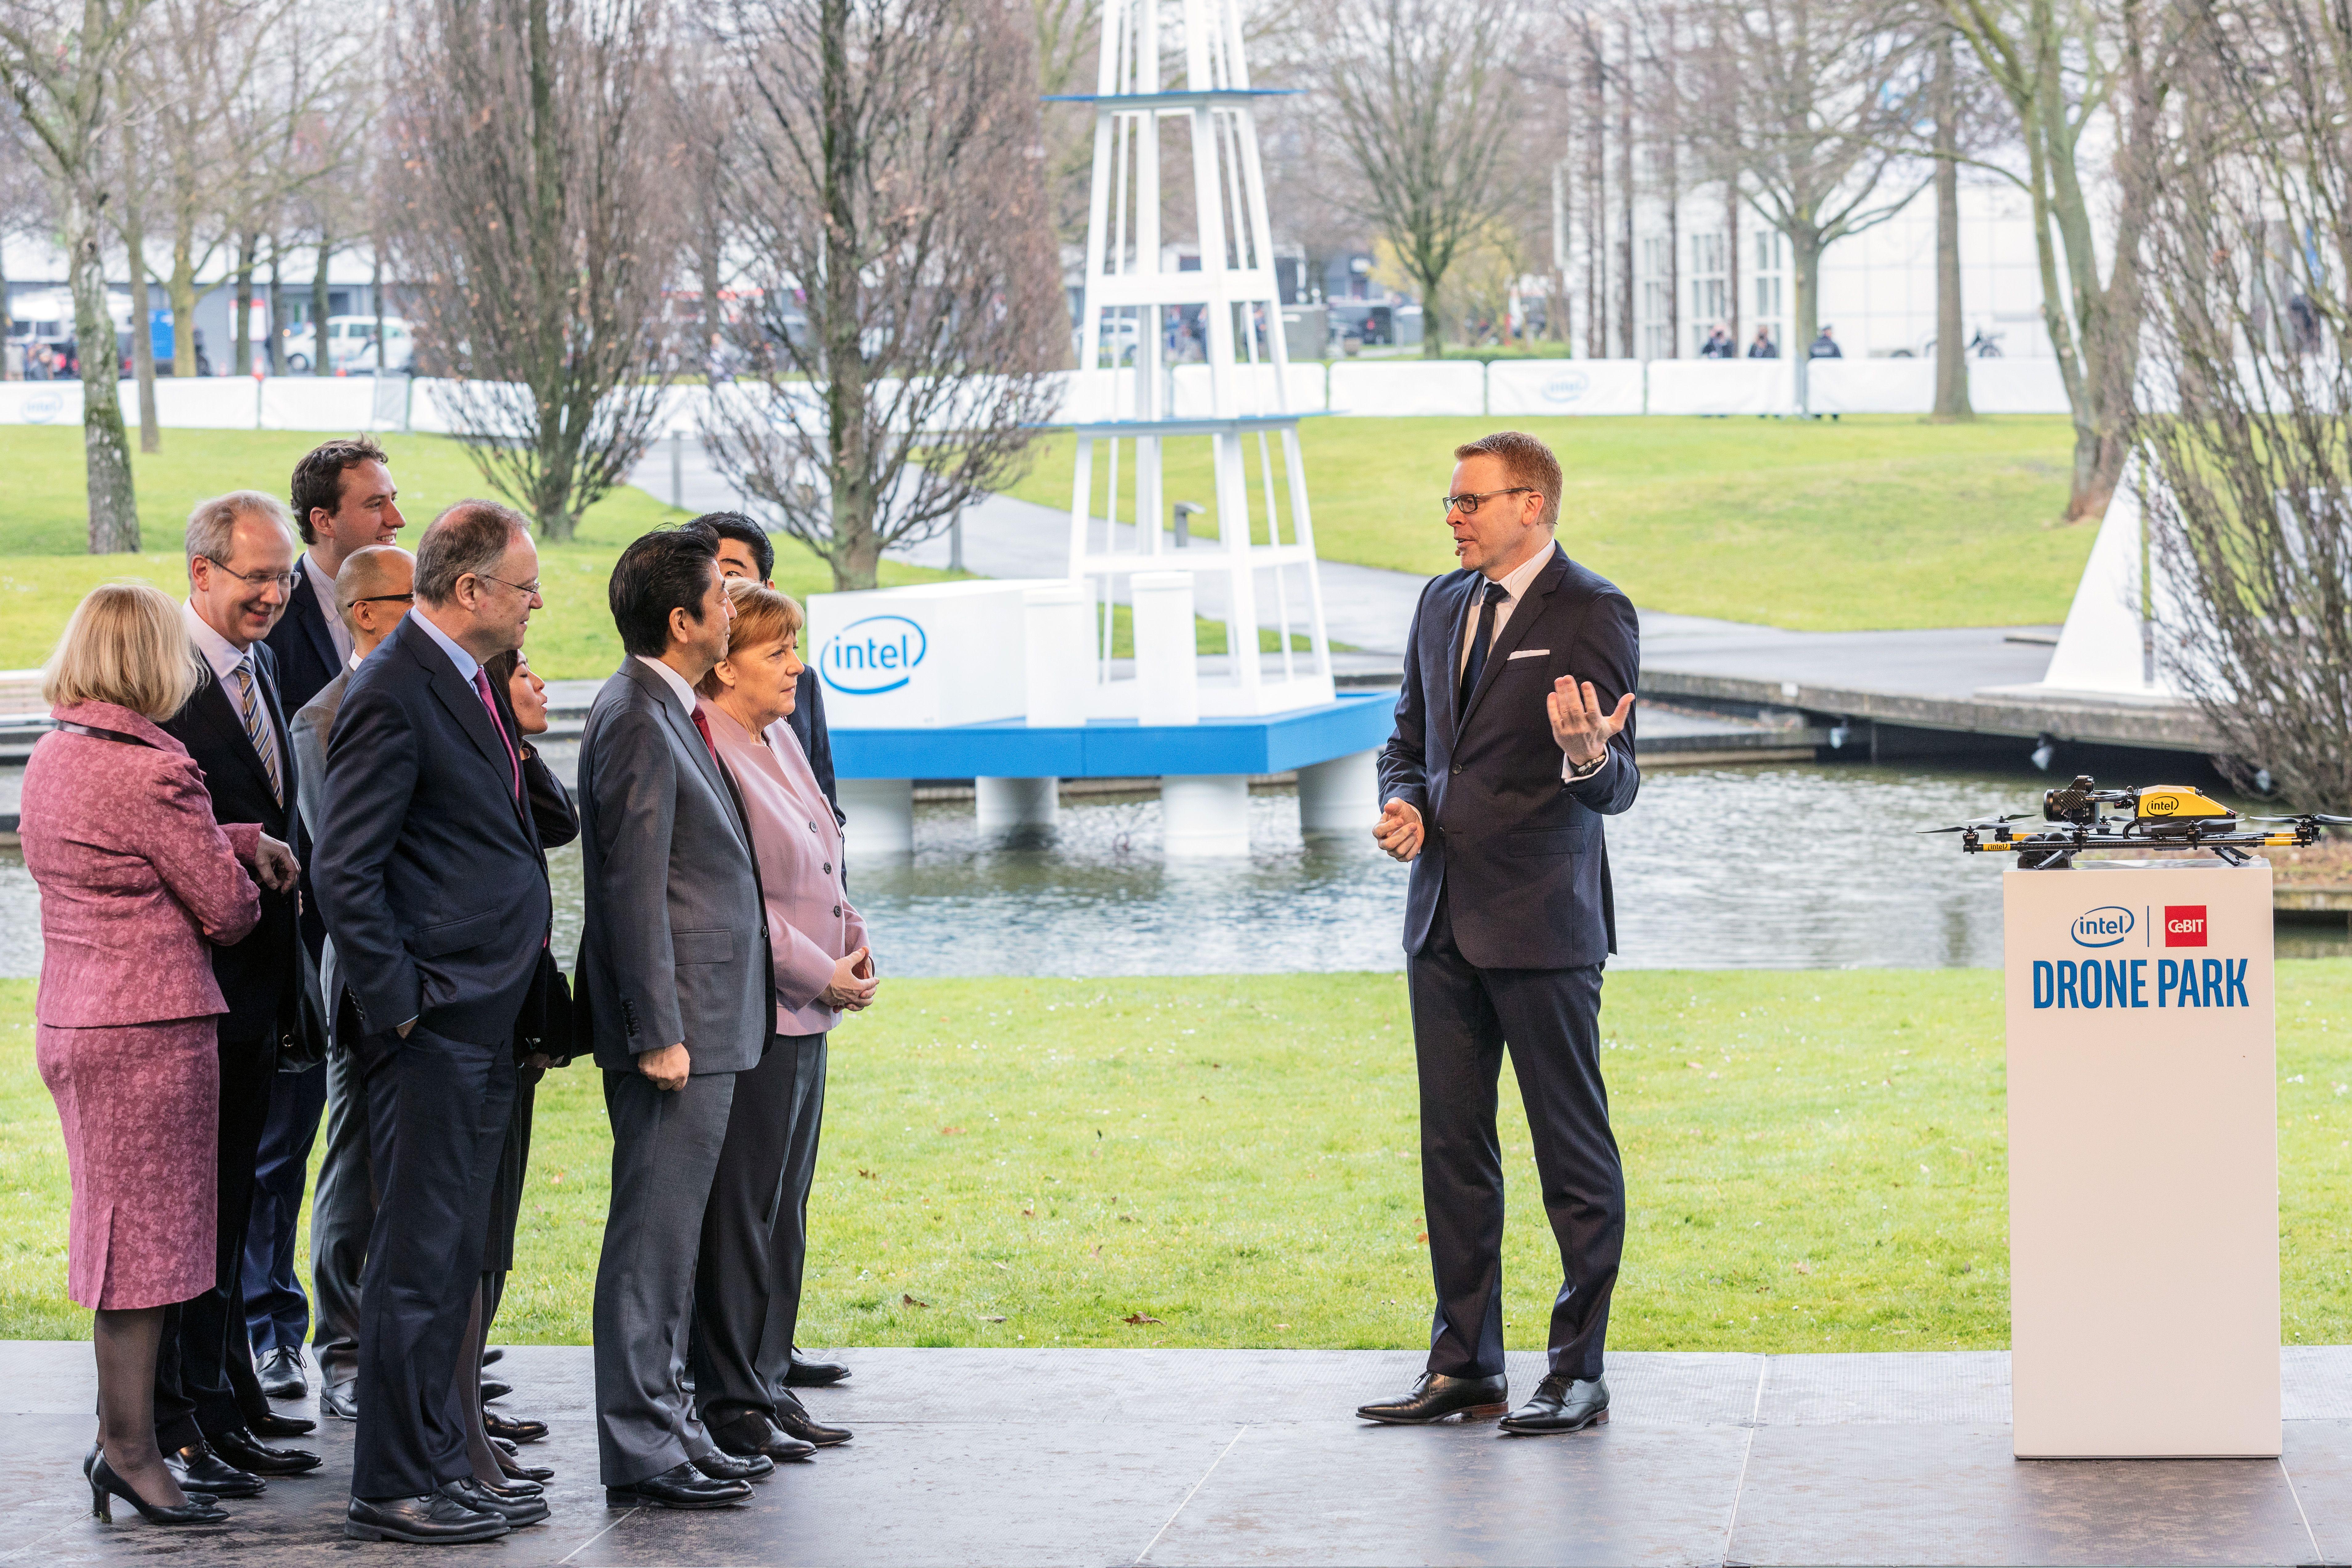 Intel CeBIT Drone Park_Merkel Besuch